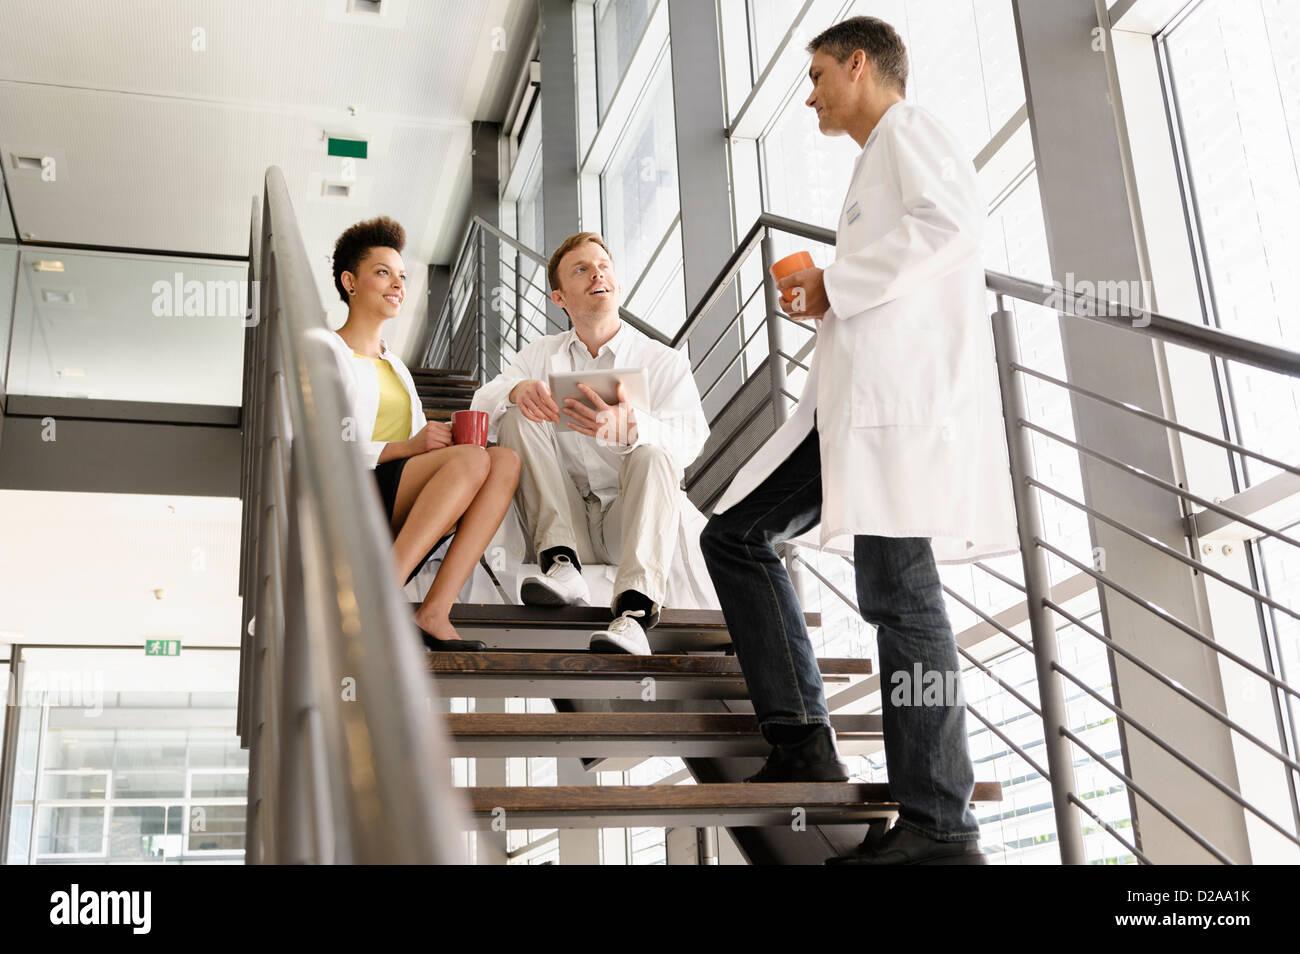 Doctors talking on steps in hospital - Stock Image